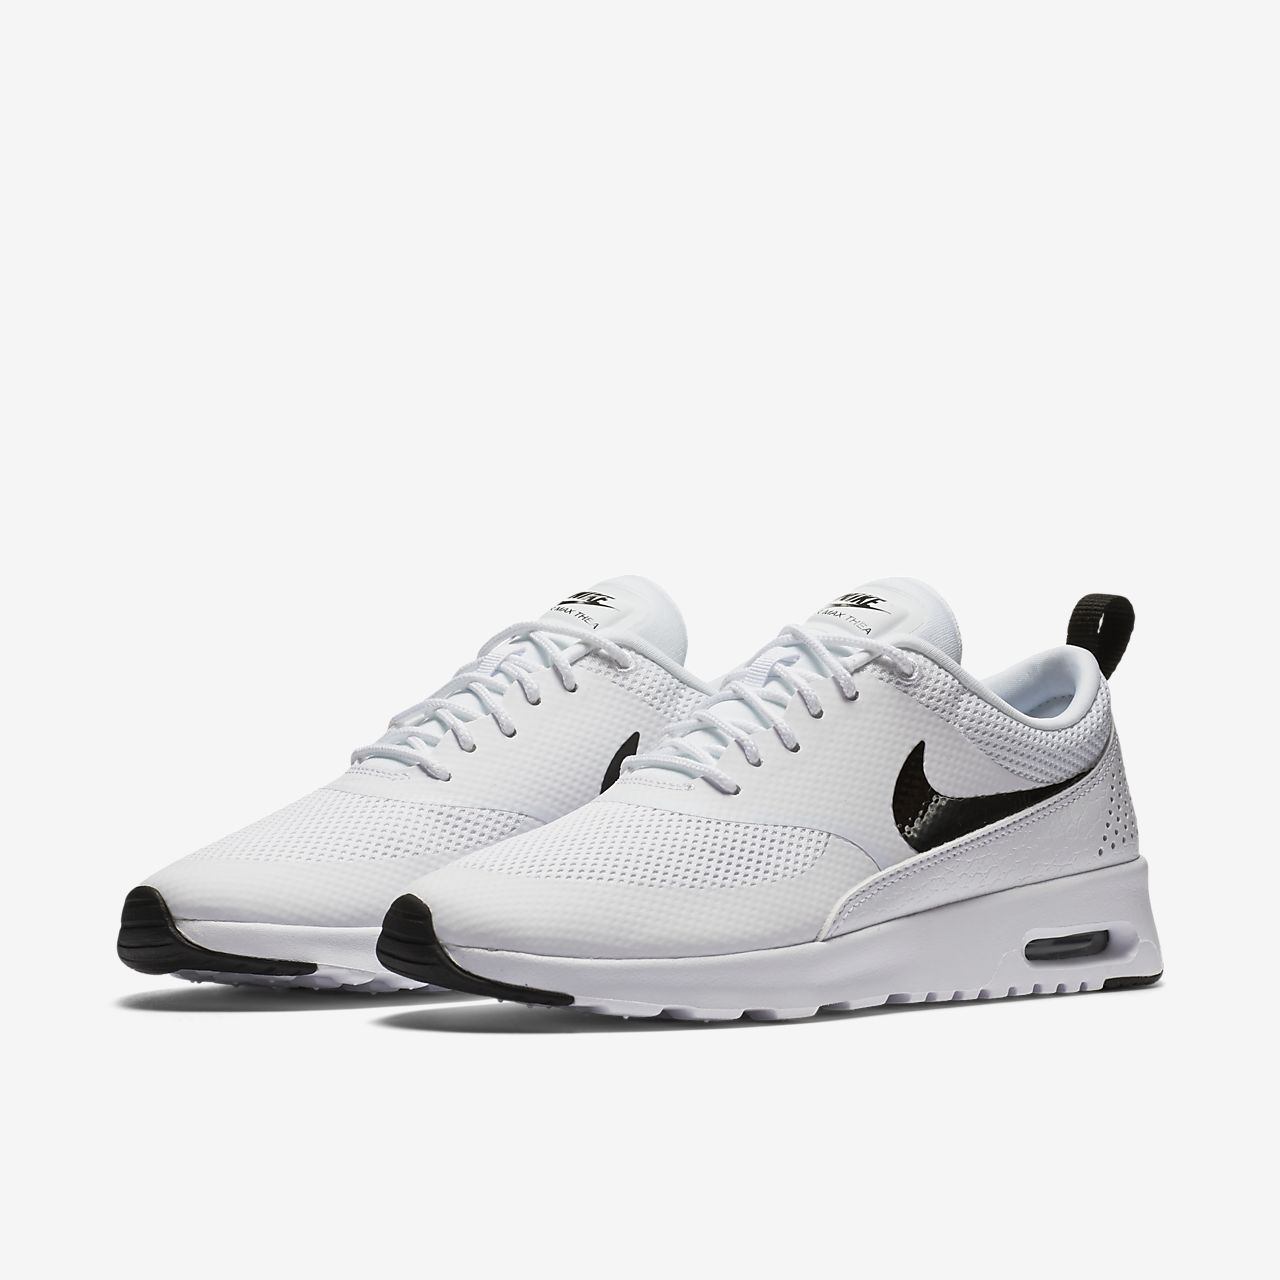 Air Max Thea Knit W chaussures noirNike HYxMb4Dp